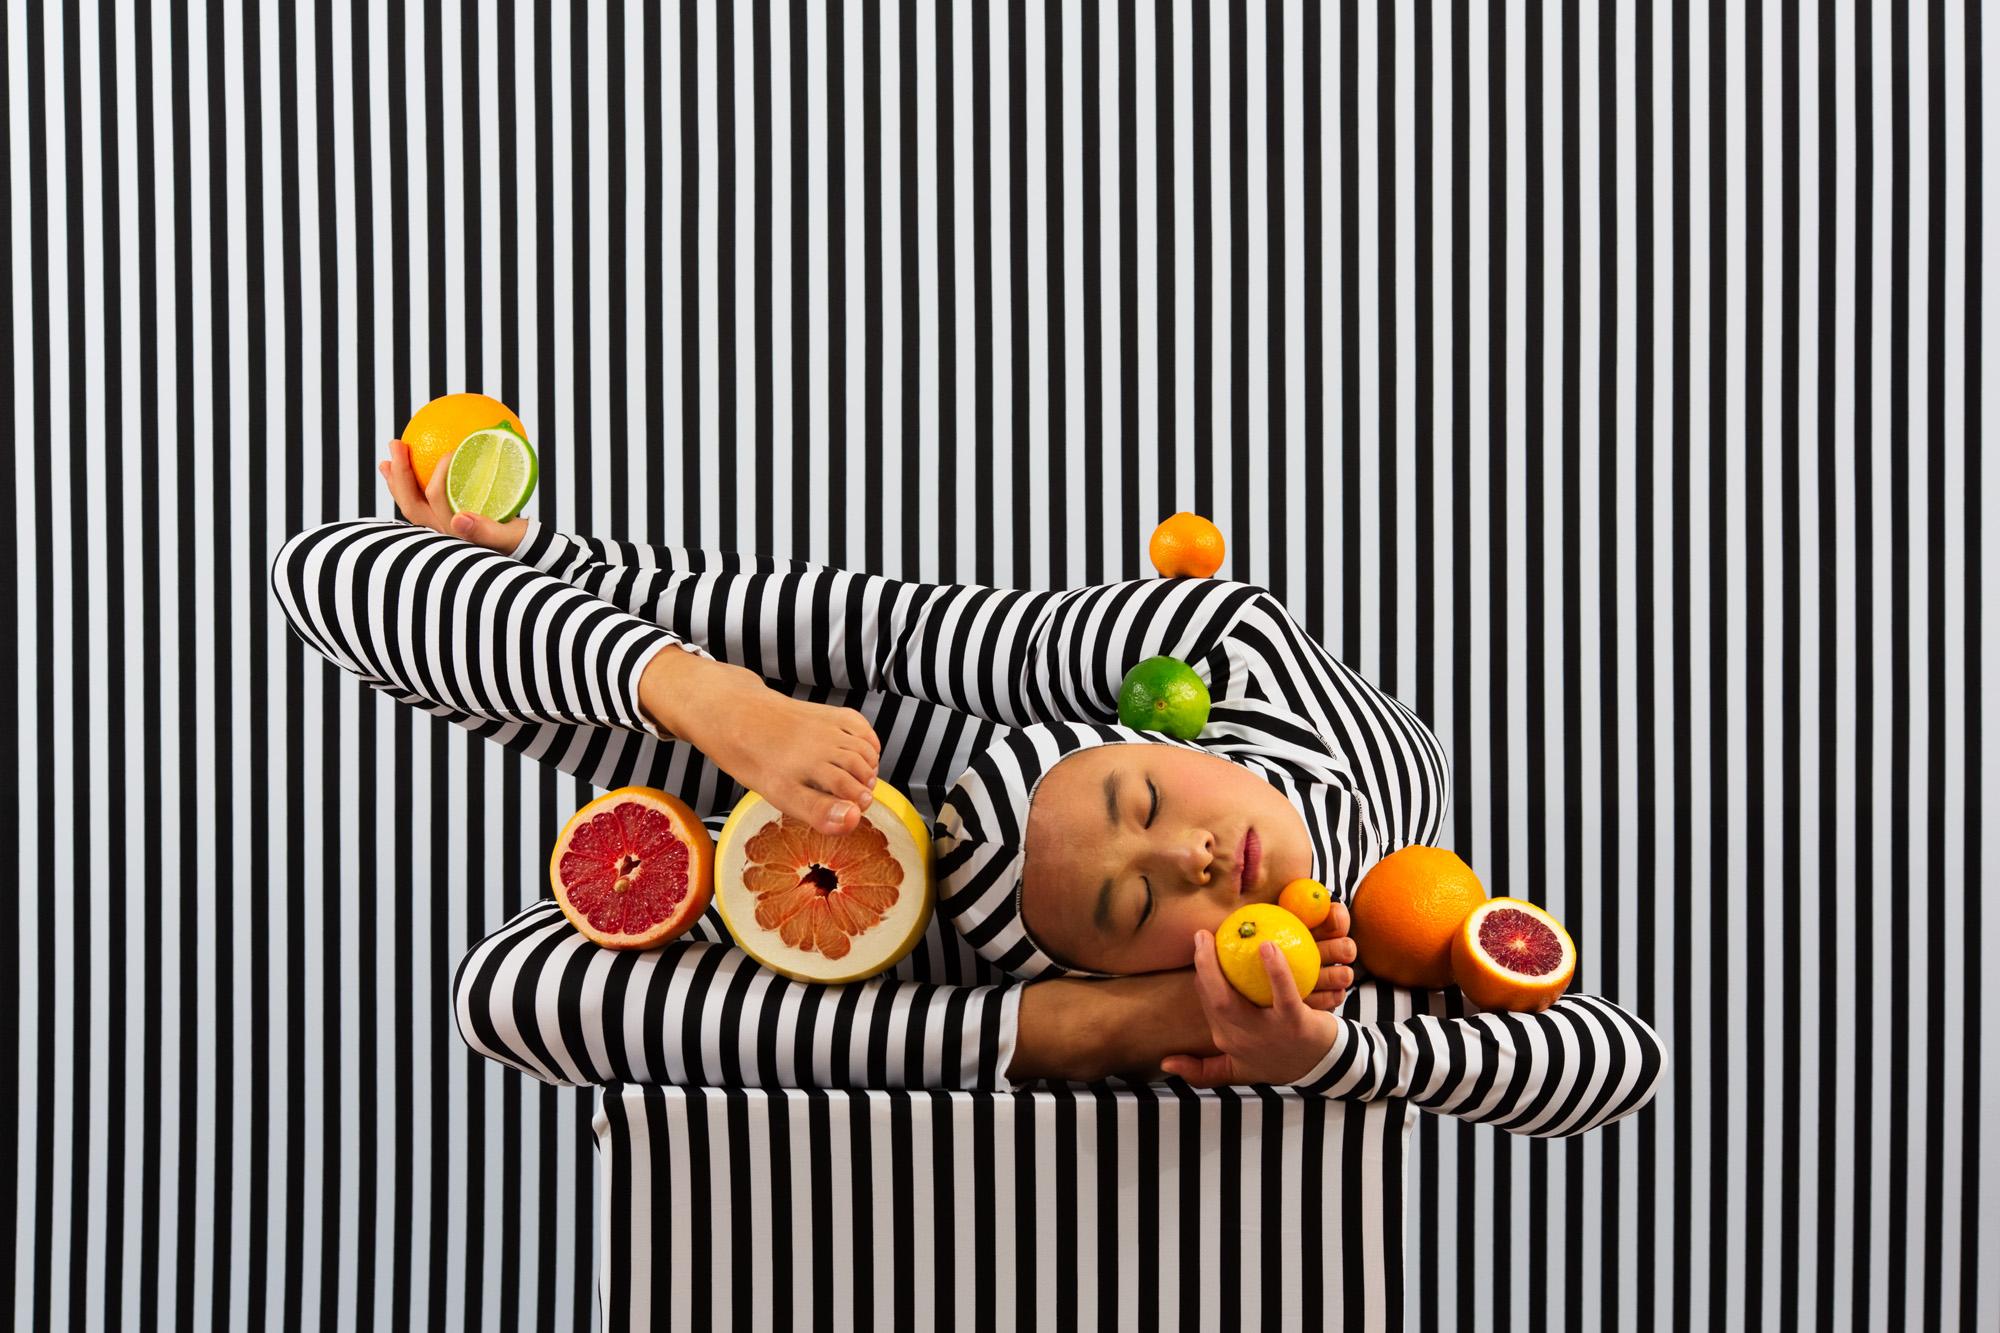 Adad Hannah,  New Arrangements (Stripes Case Study) 3 , 2018